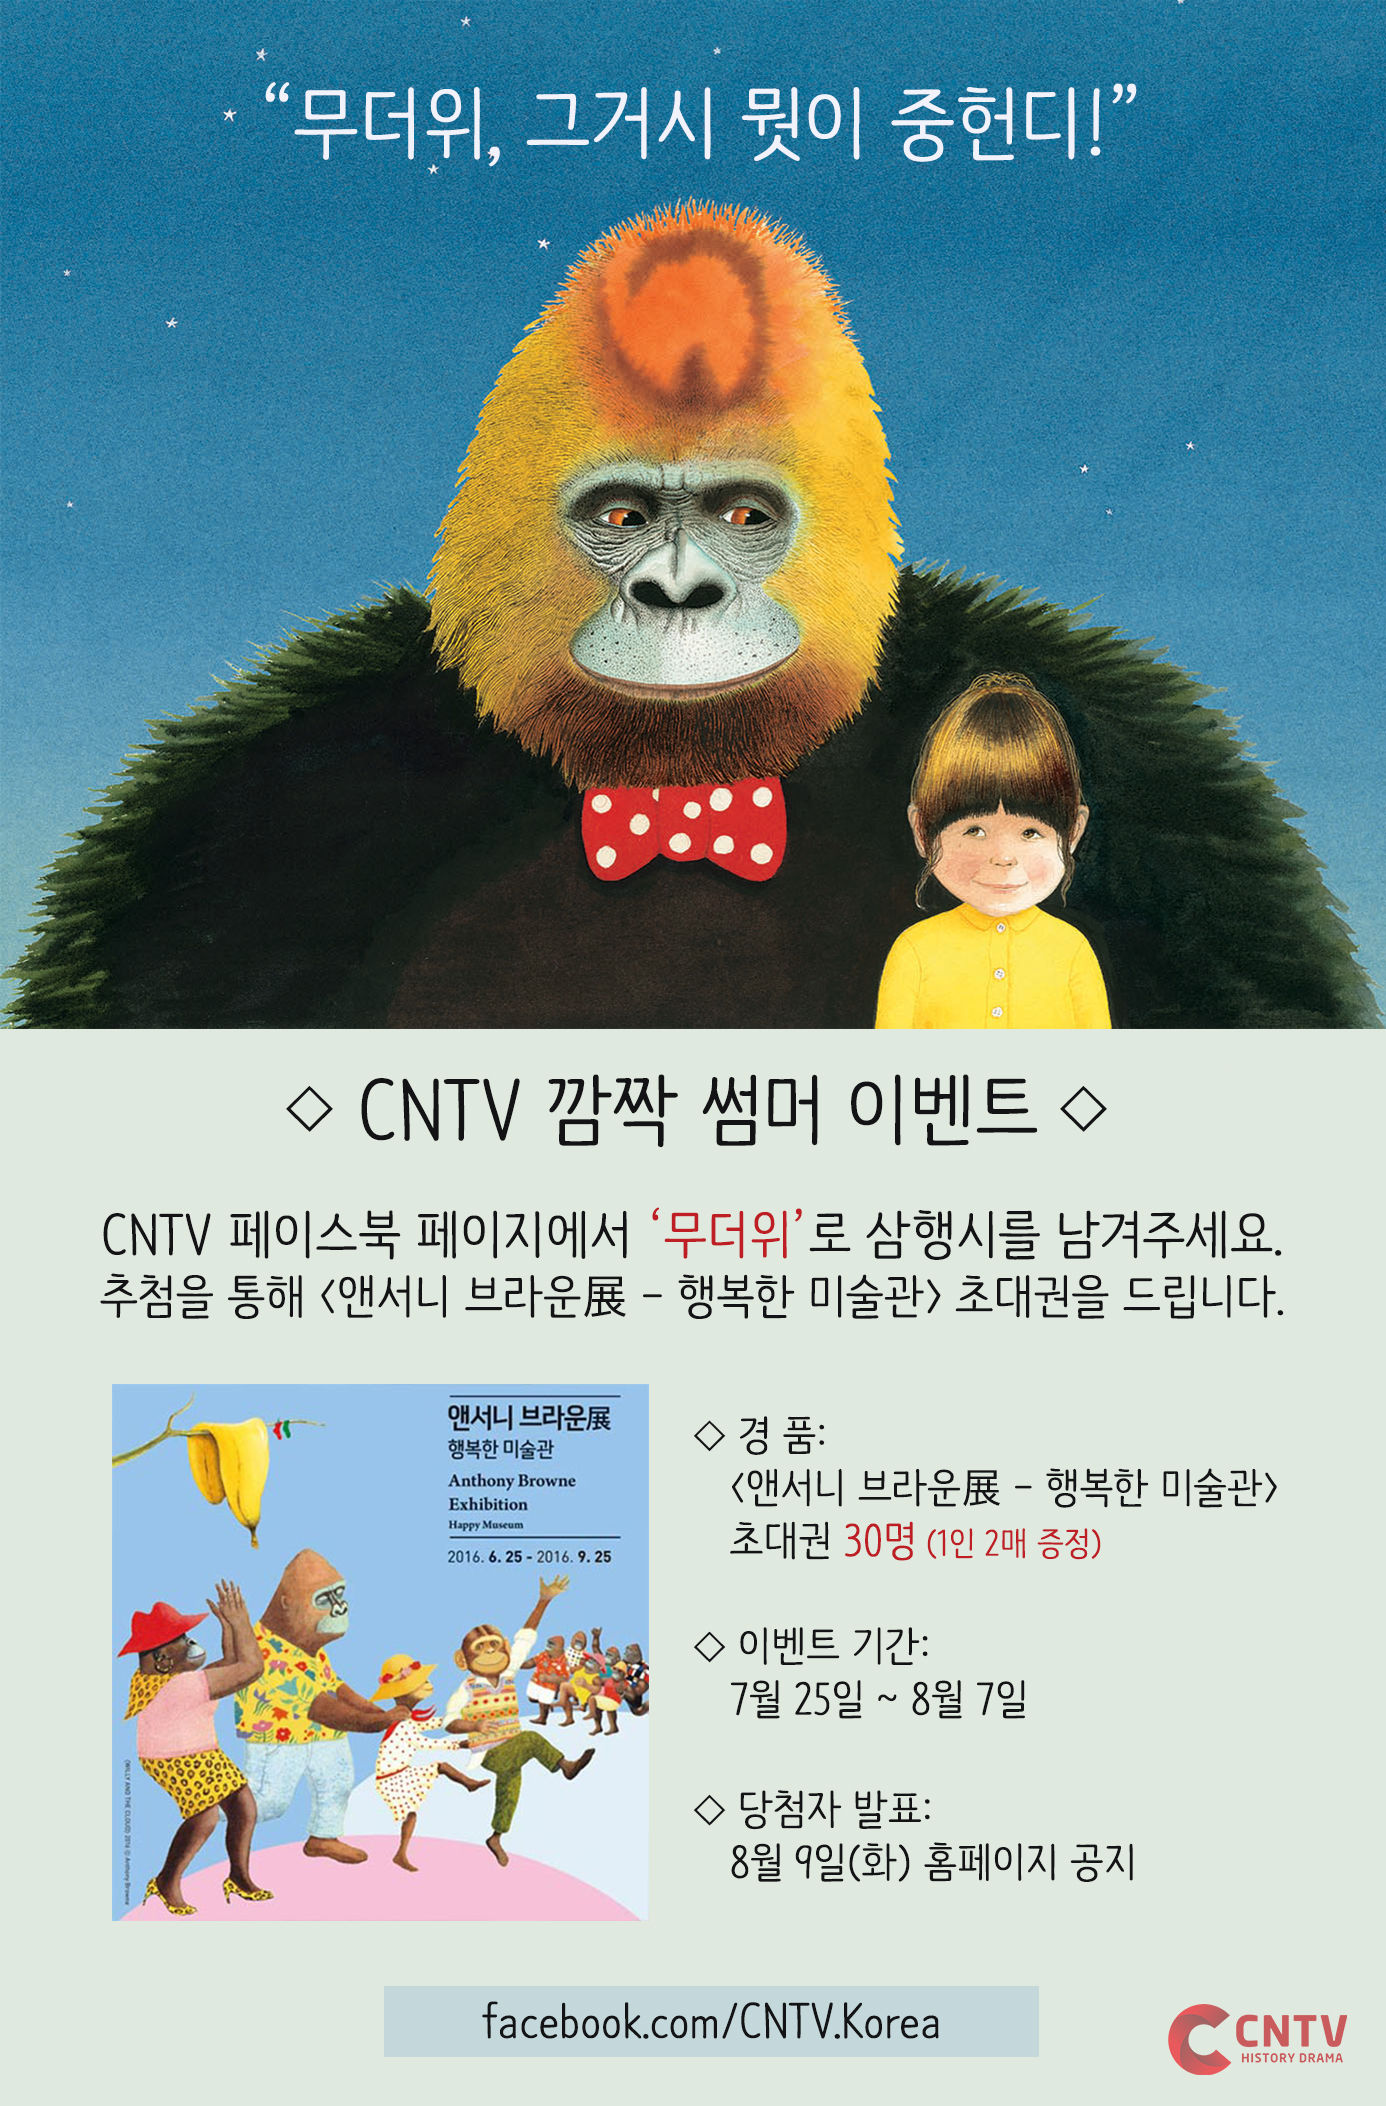 CNTV_event_img2.jpg